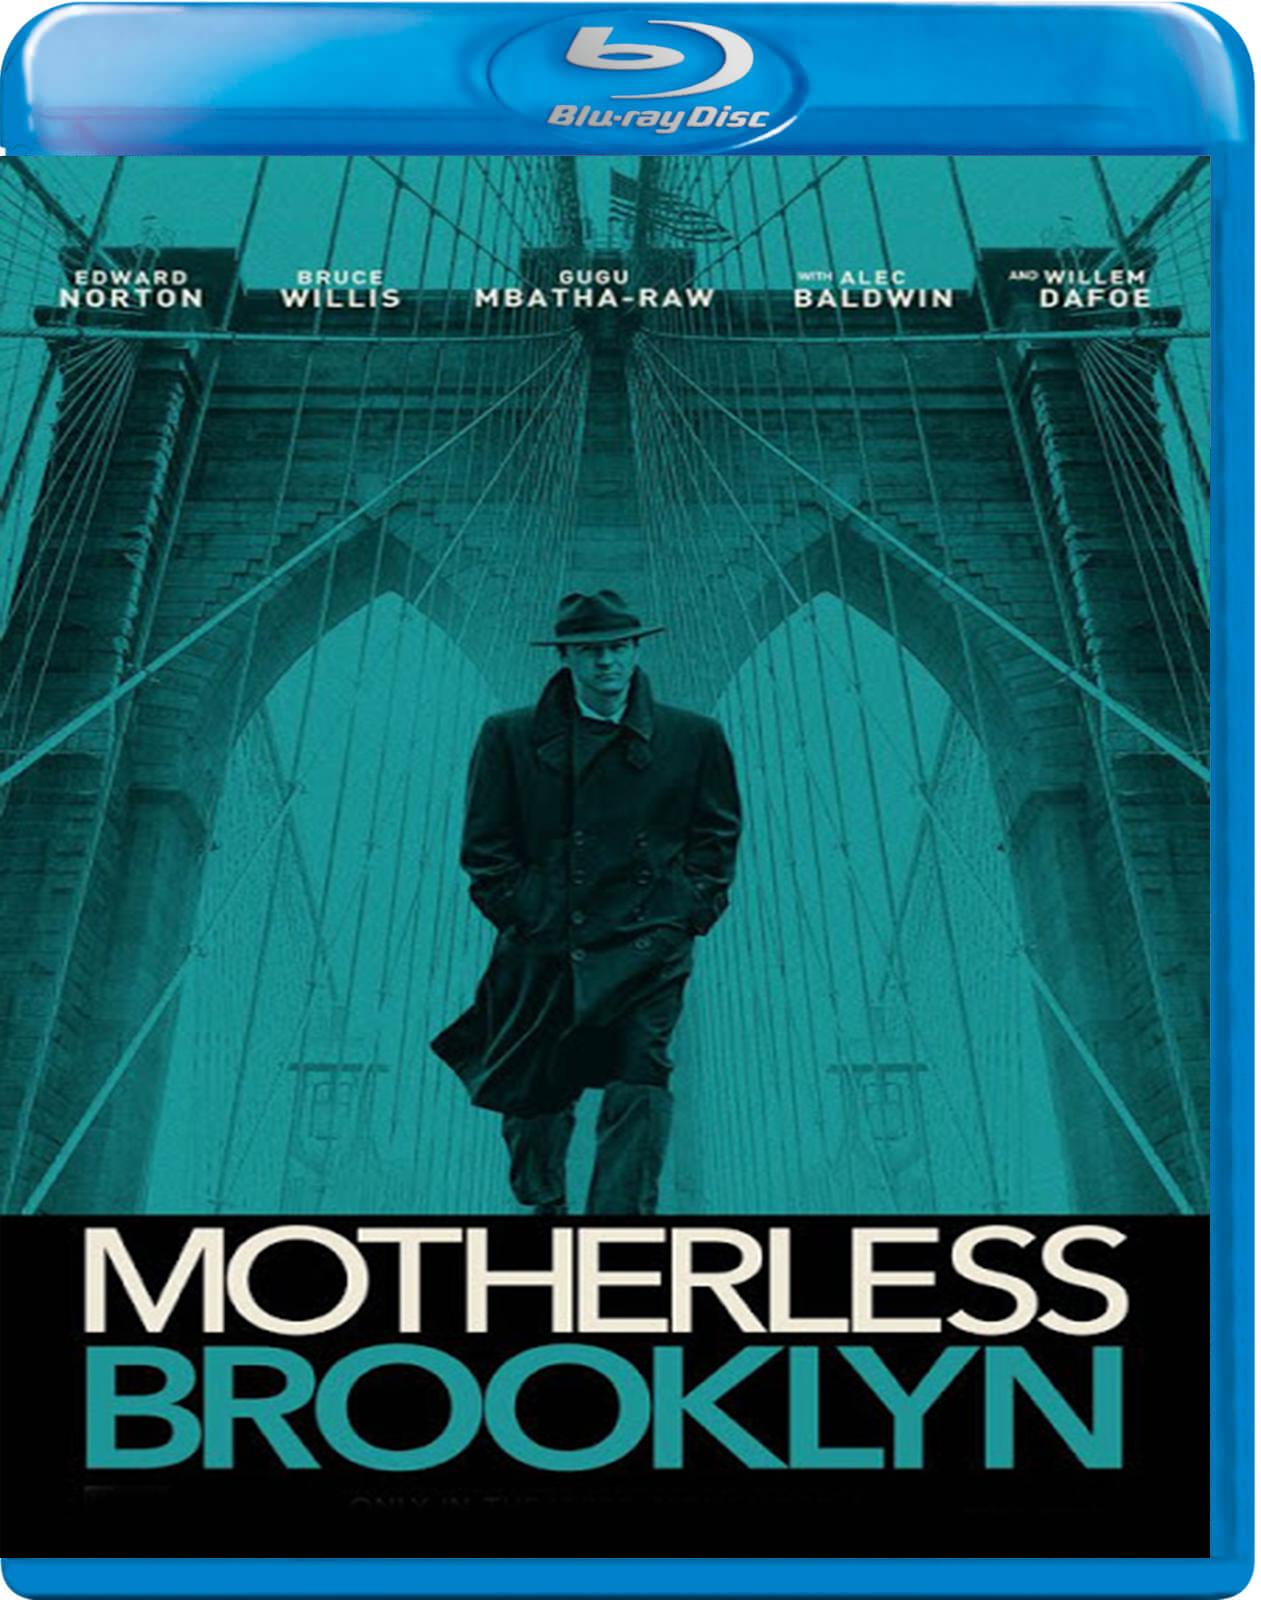 Motherless Brooklyn [2019] [BD50] [Latino]